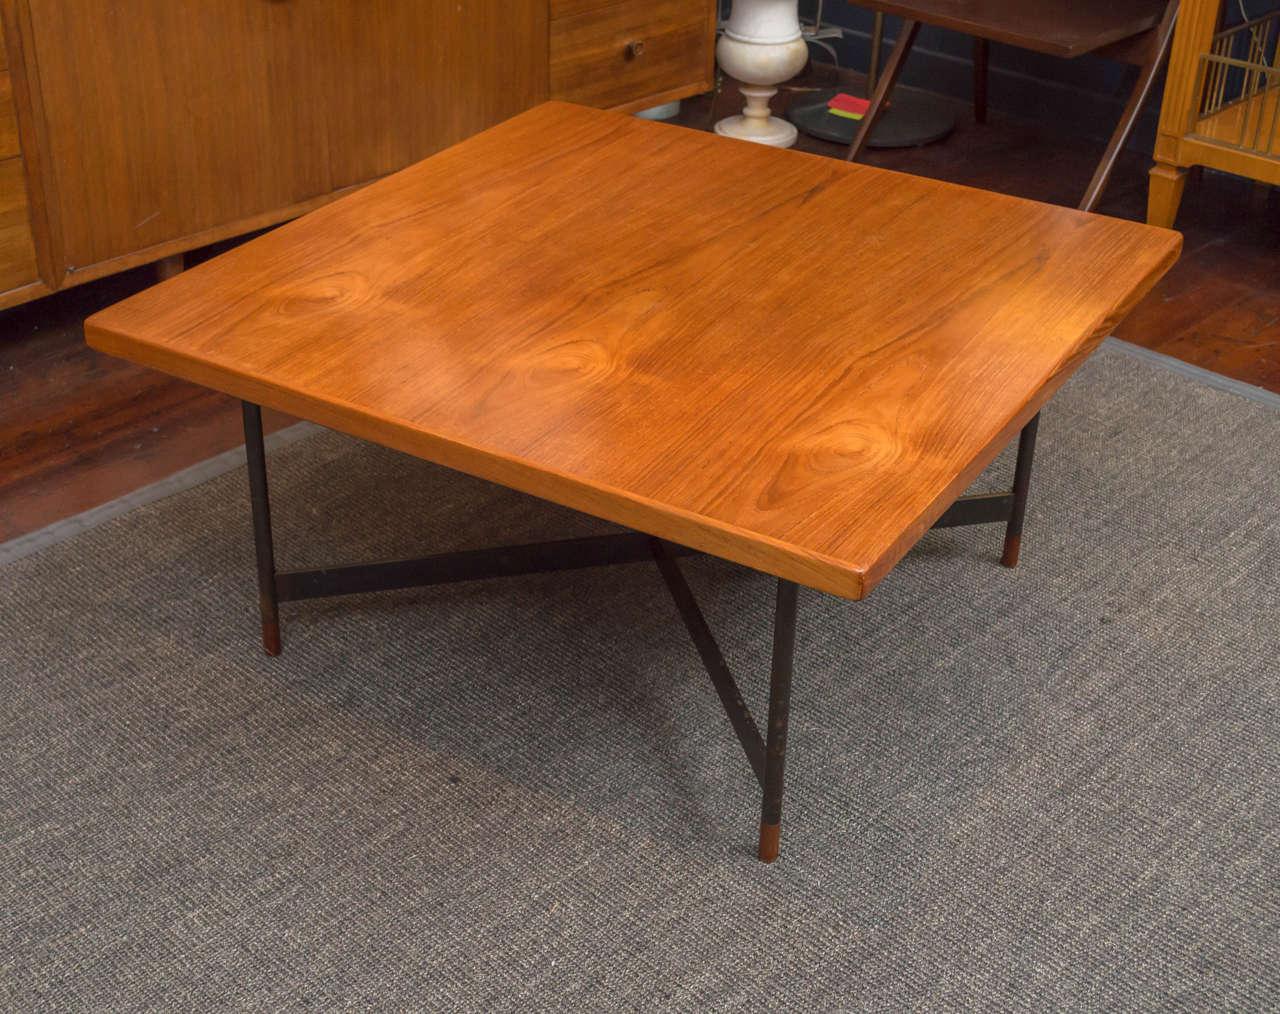 Rare Finn Juhl Coffee Table In Good Condition For Sale In San Francisco, CA